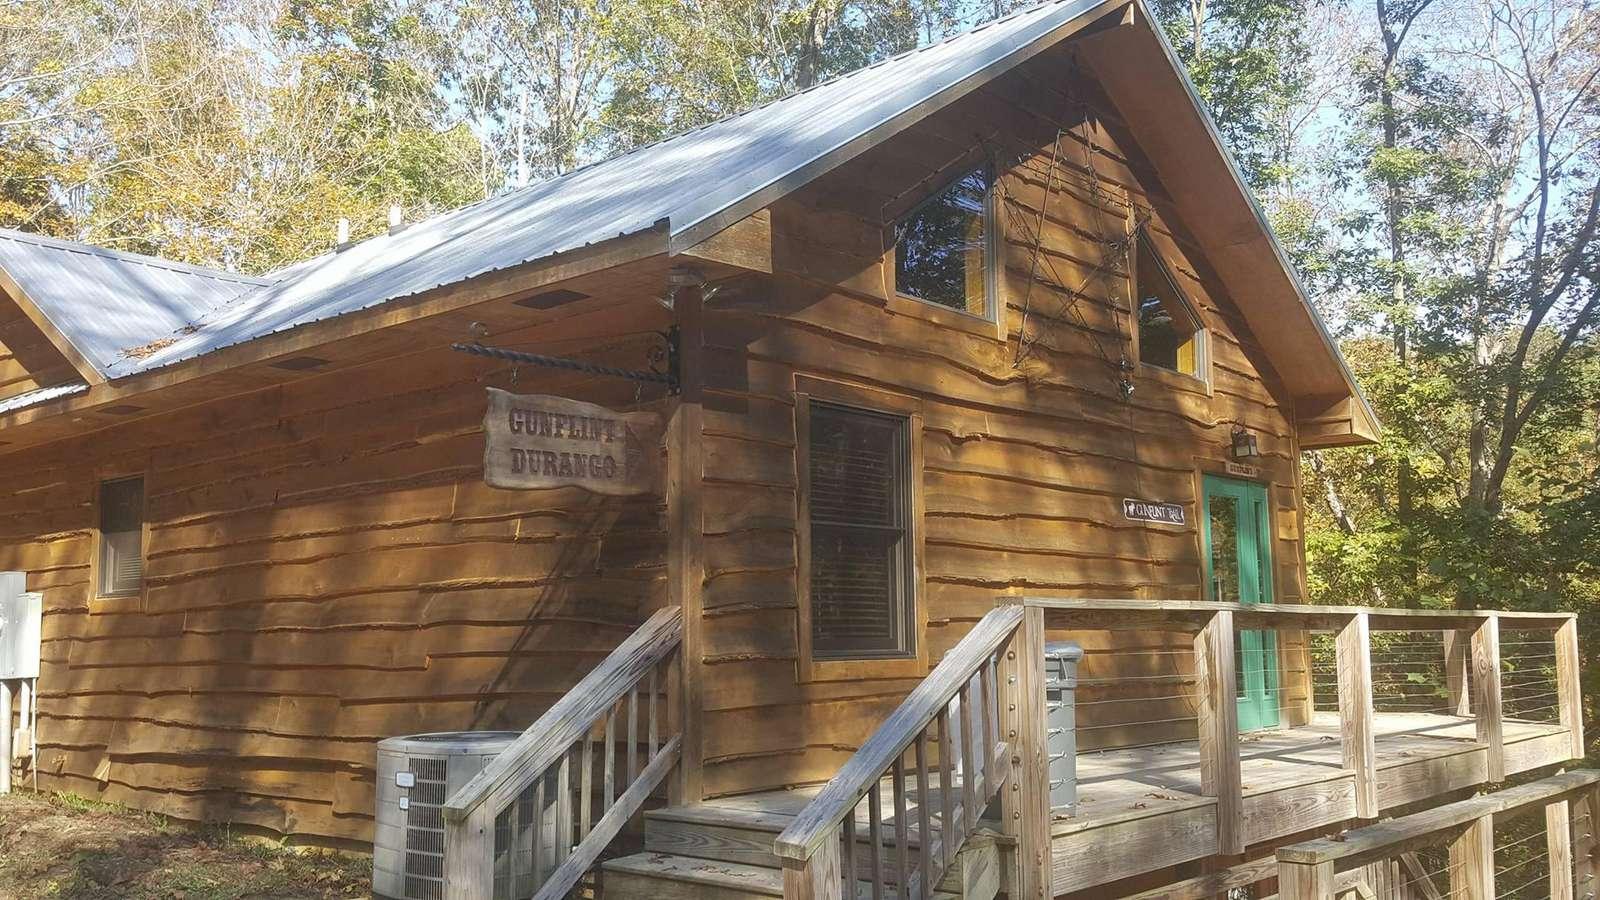 The Durango Room Suite - property